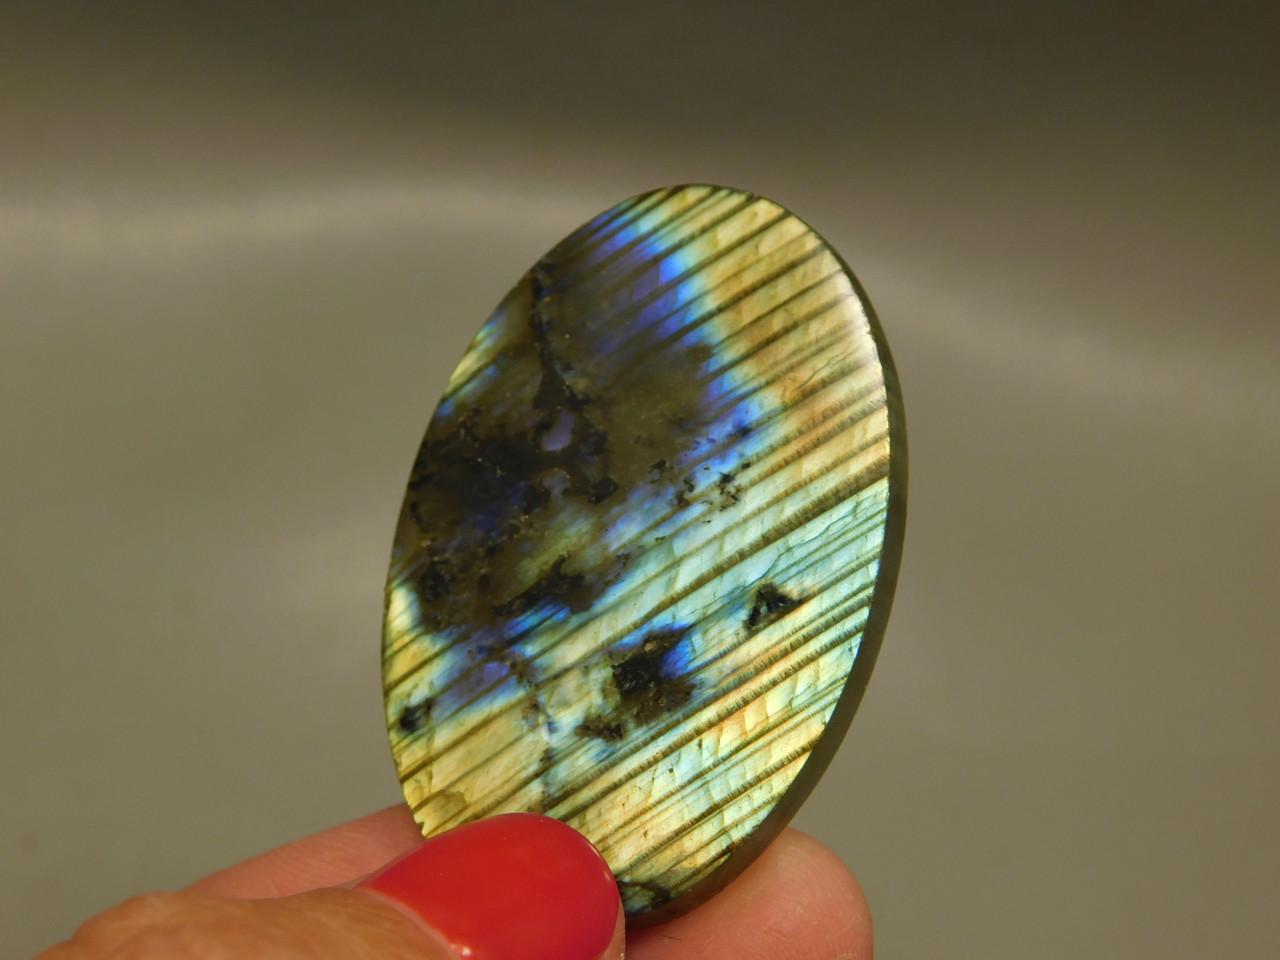 Iridescent Labradorite Jewelry Making Supplies Loose Cabochon #13